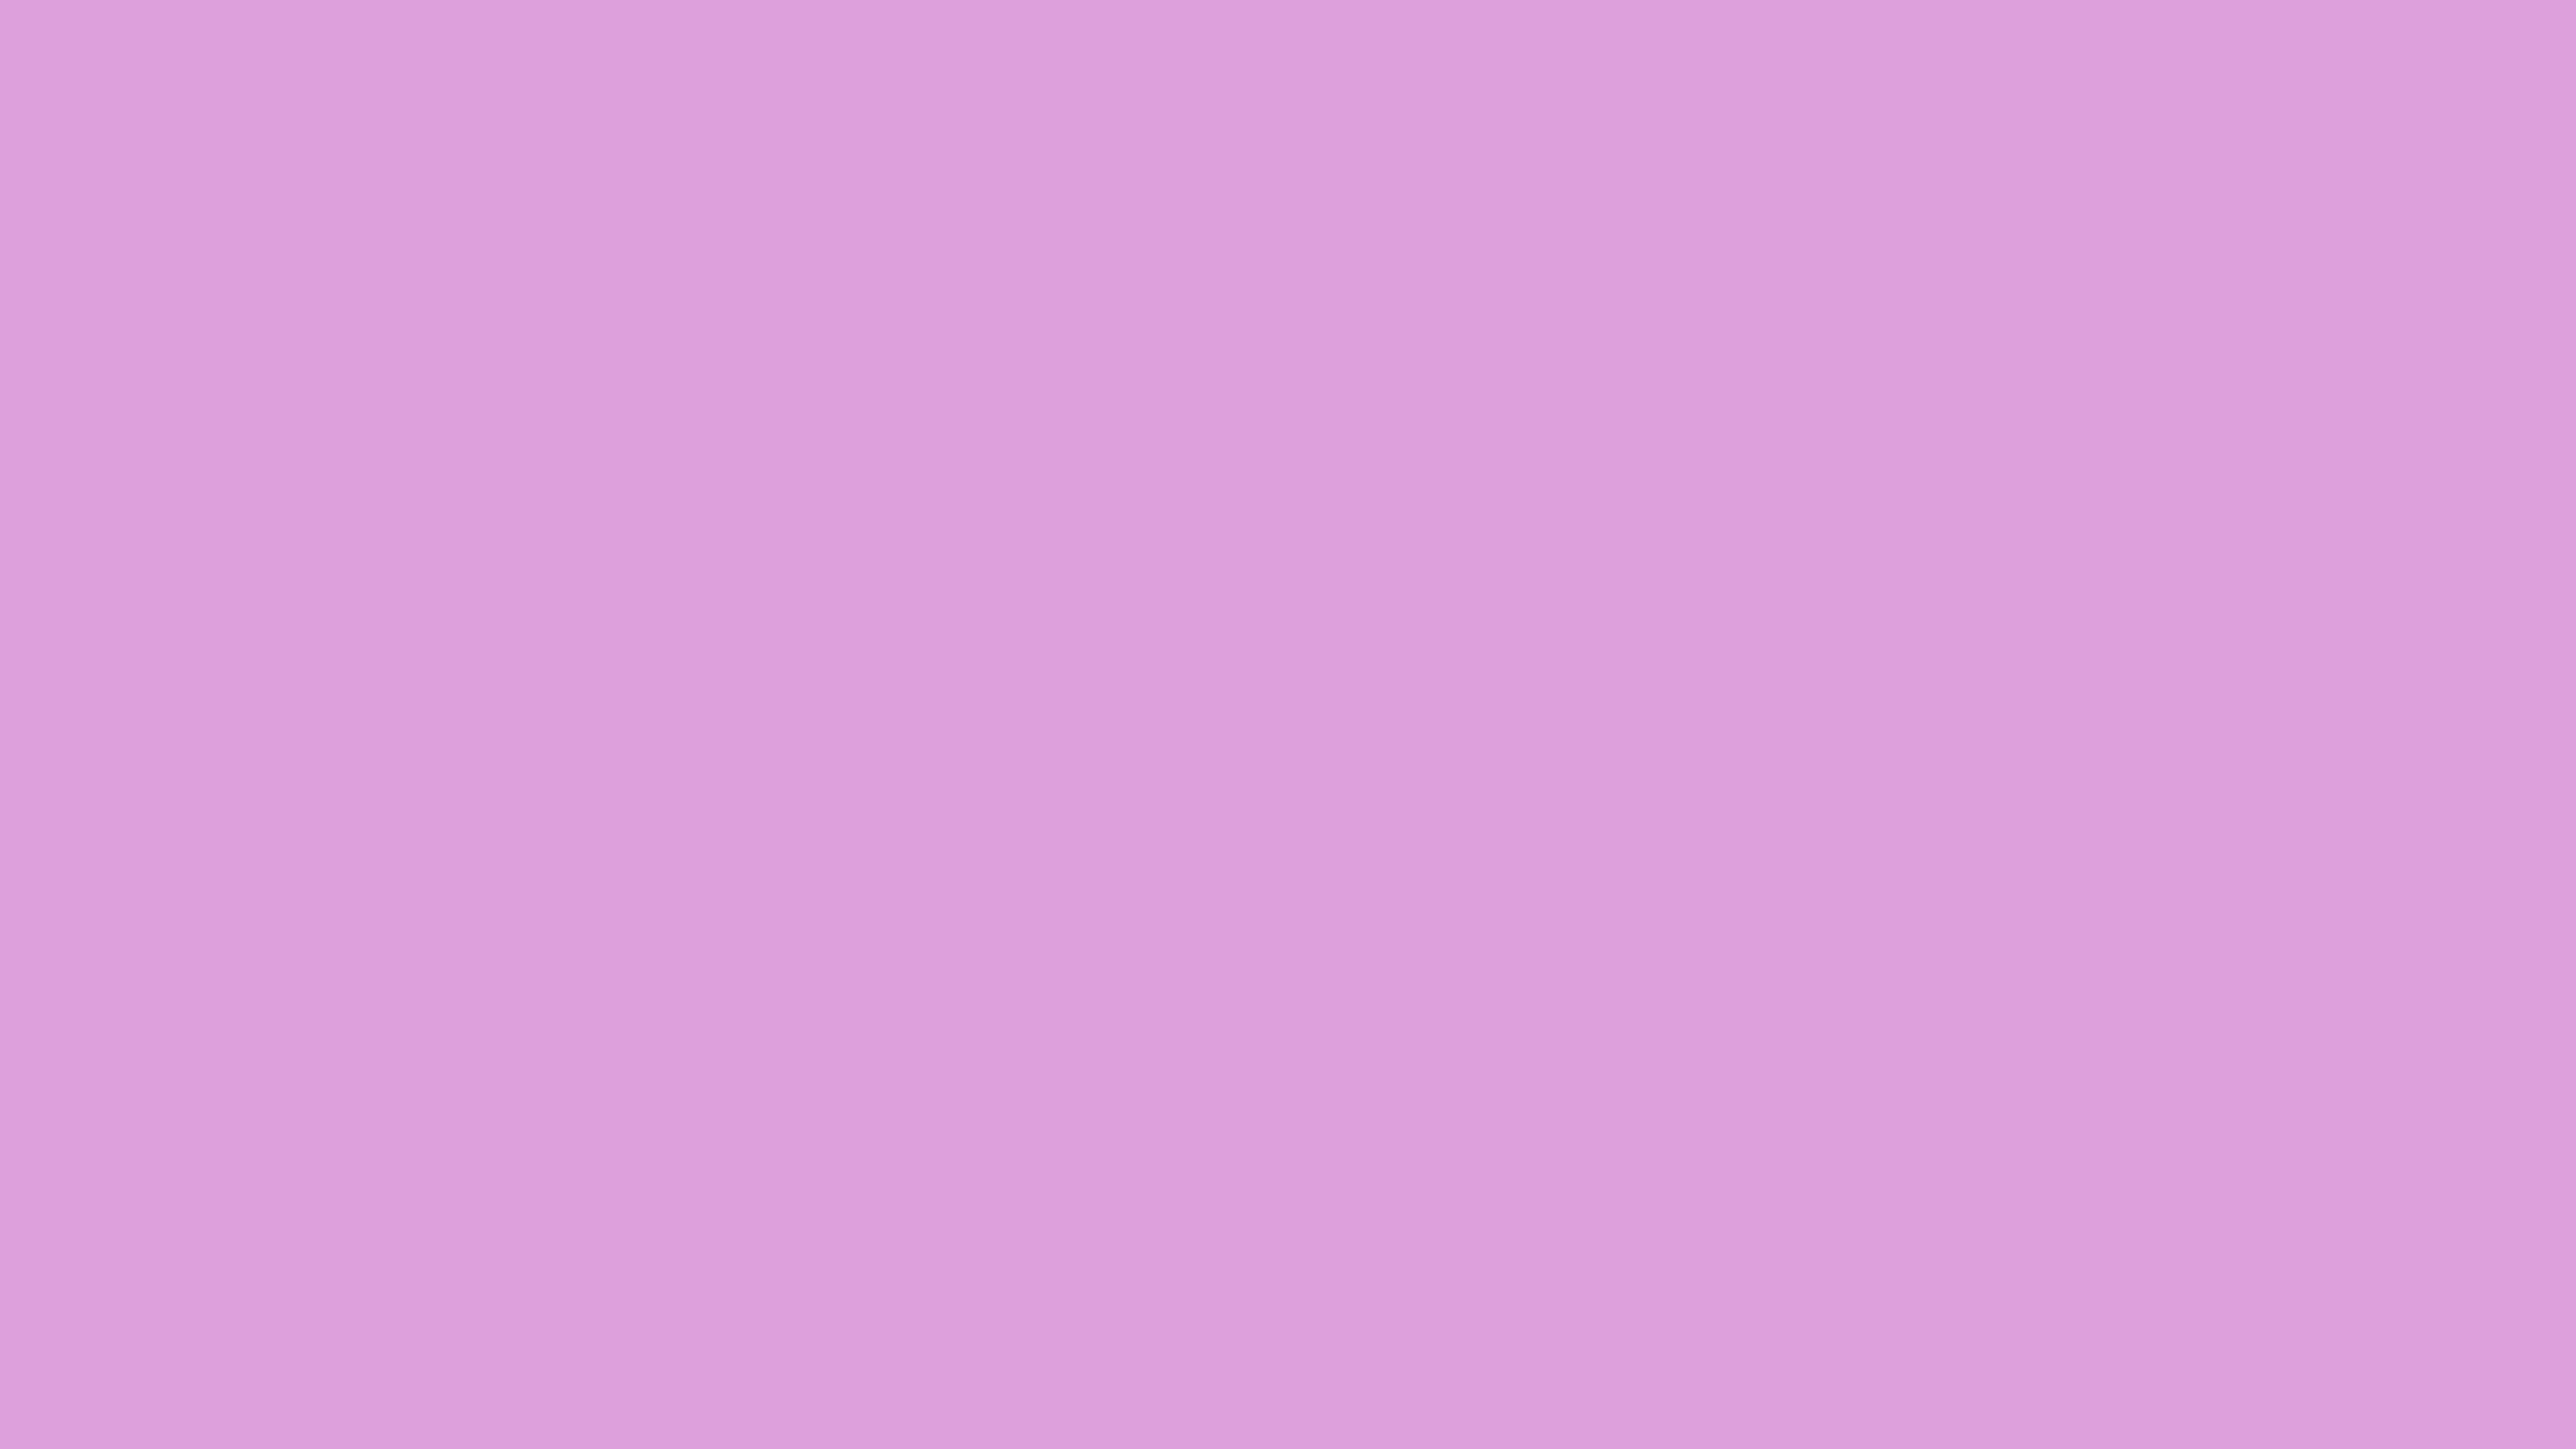 5120x2880 Plum Web Solid Color Background